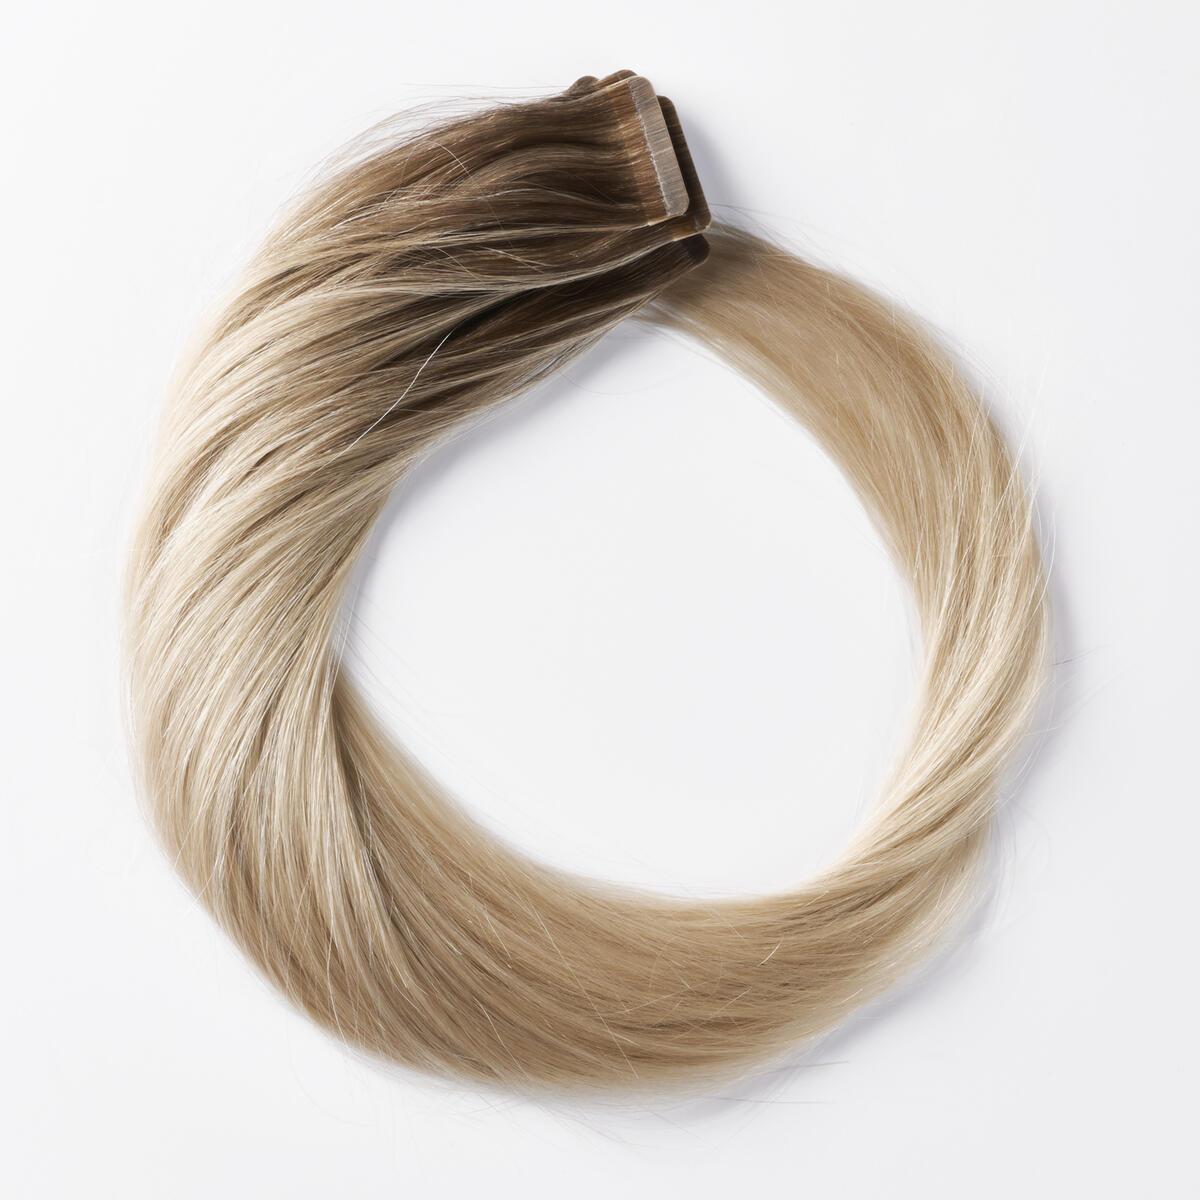 Rapunzel Sleek Tape Extension C2.2/10.5 Dark Cool Blonde ColorMelt 45 cm